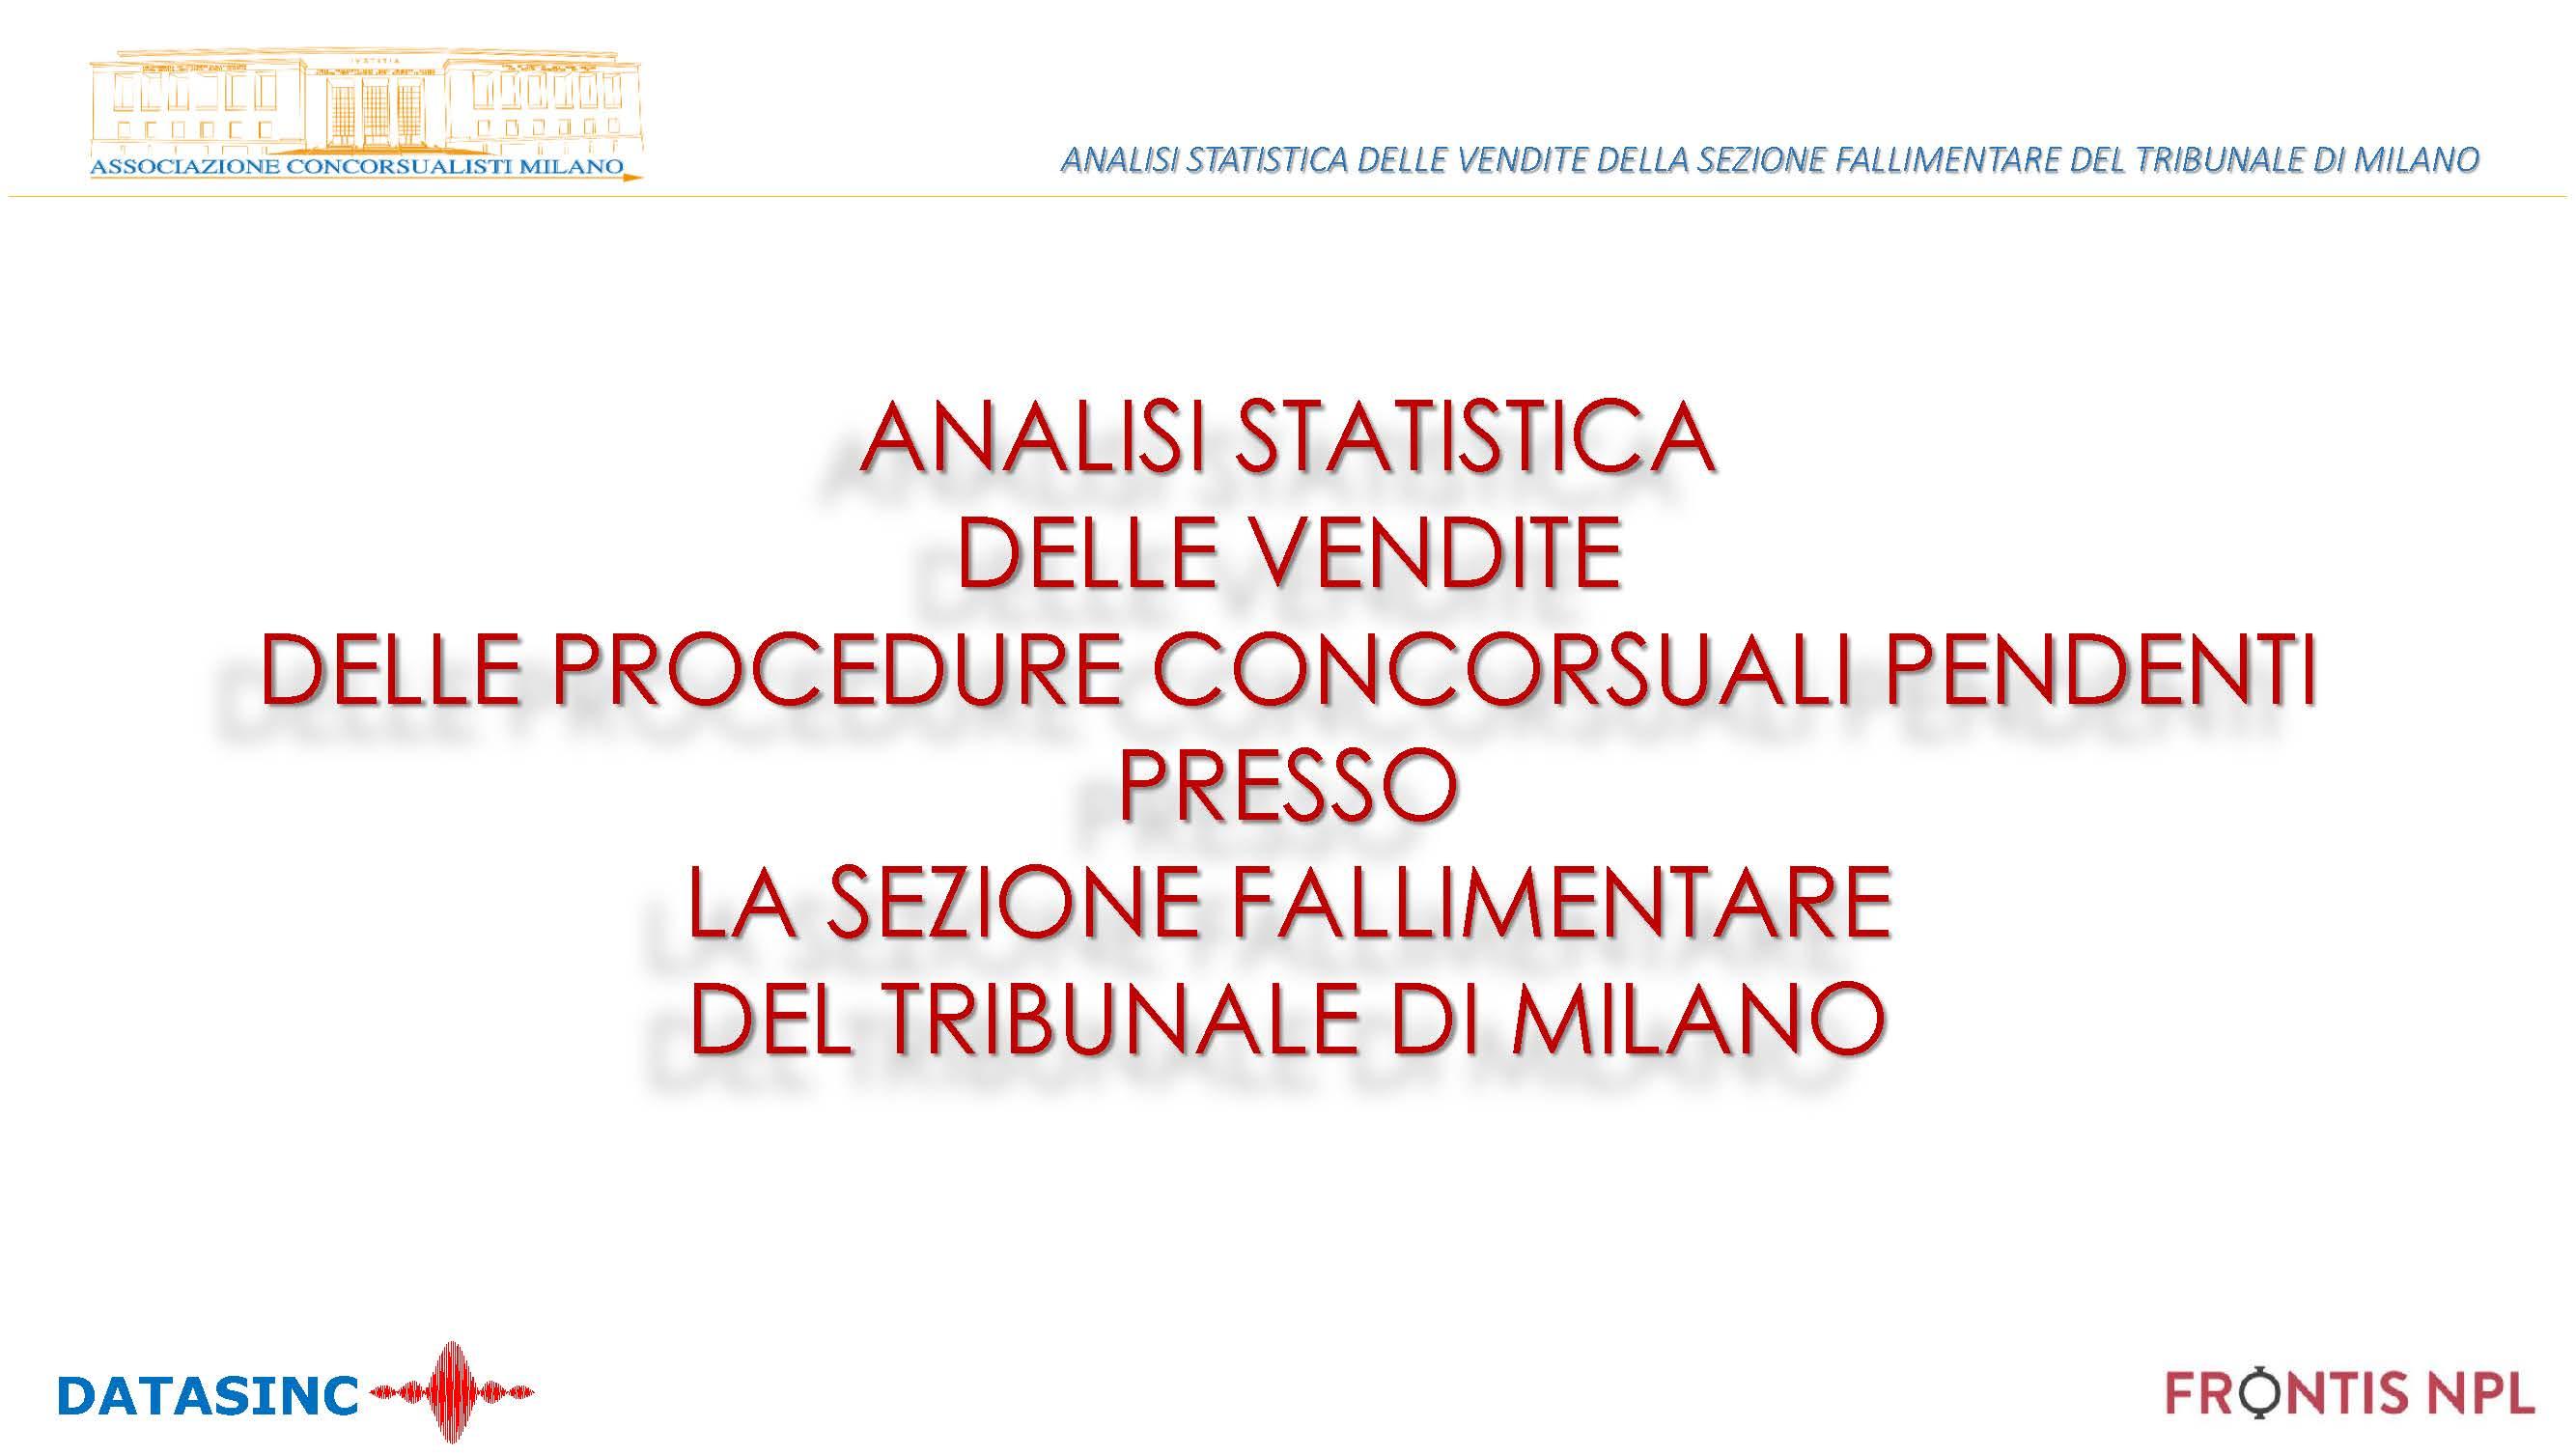 Presentazione ACM definitiva_Pagina_01